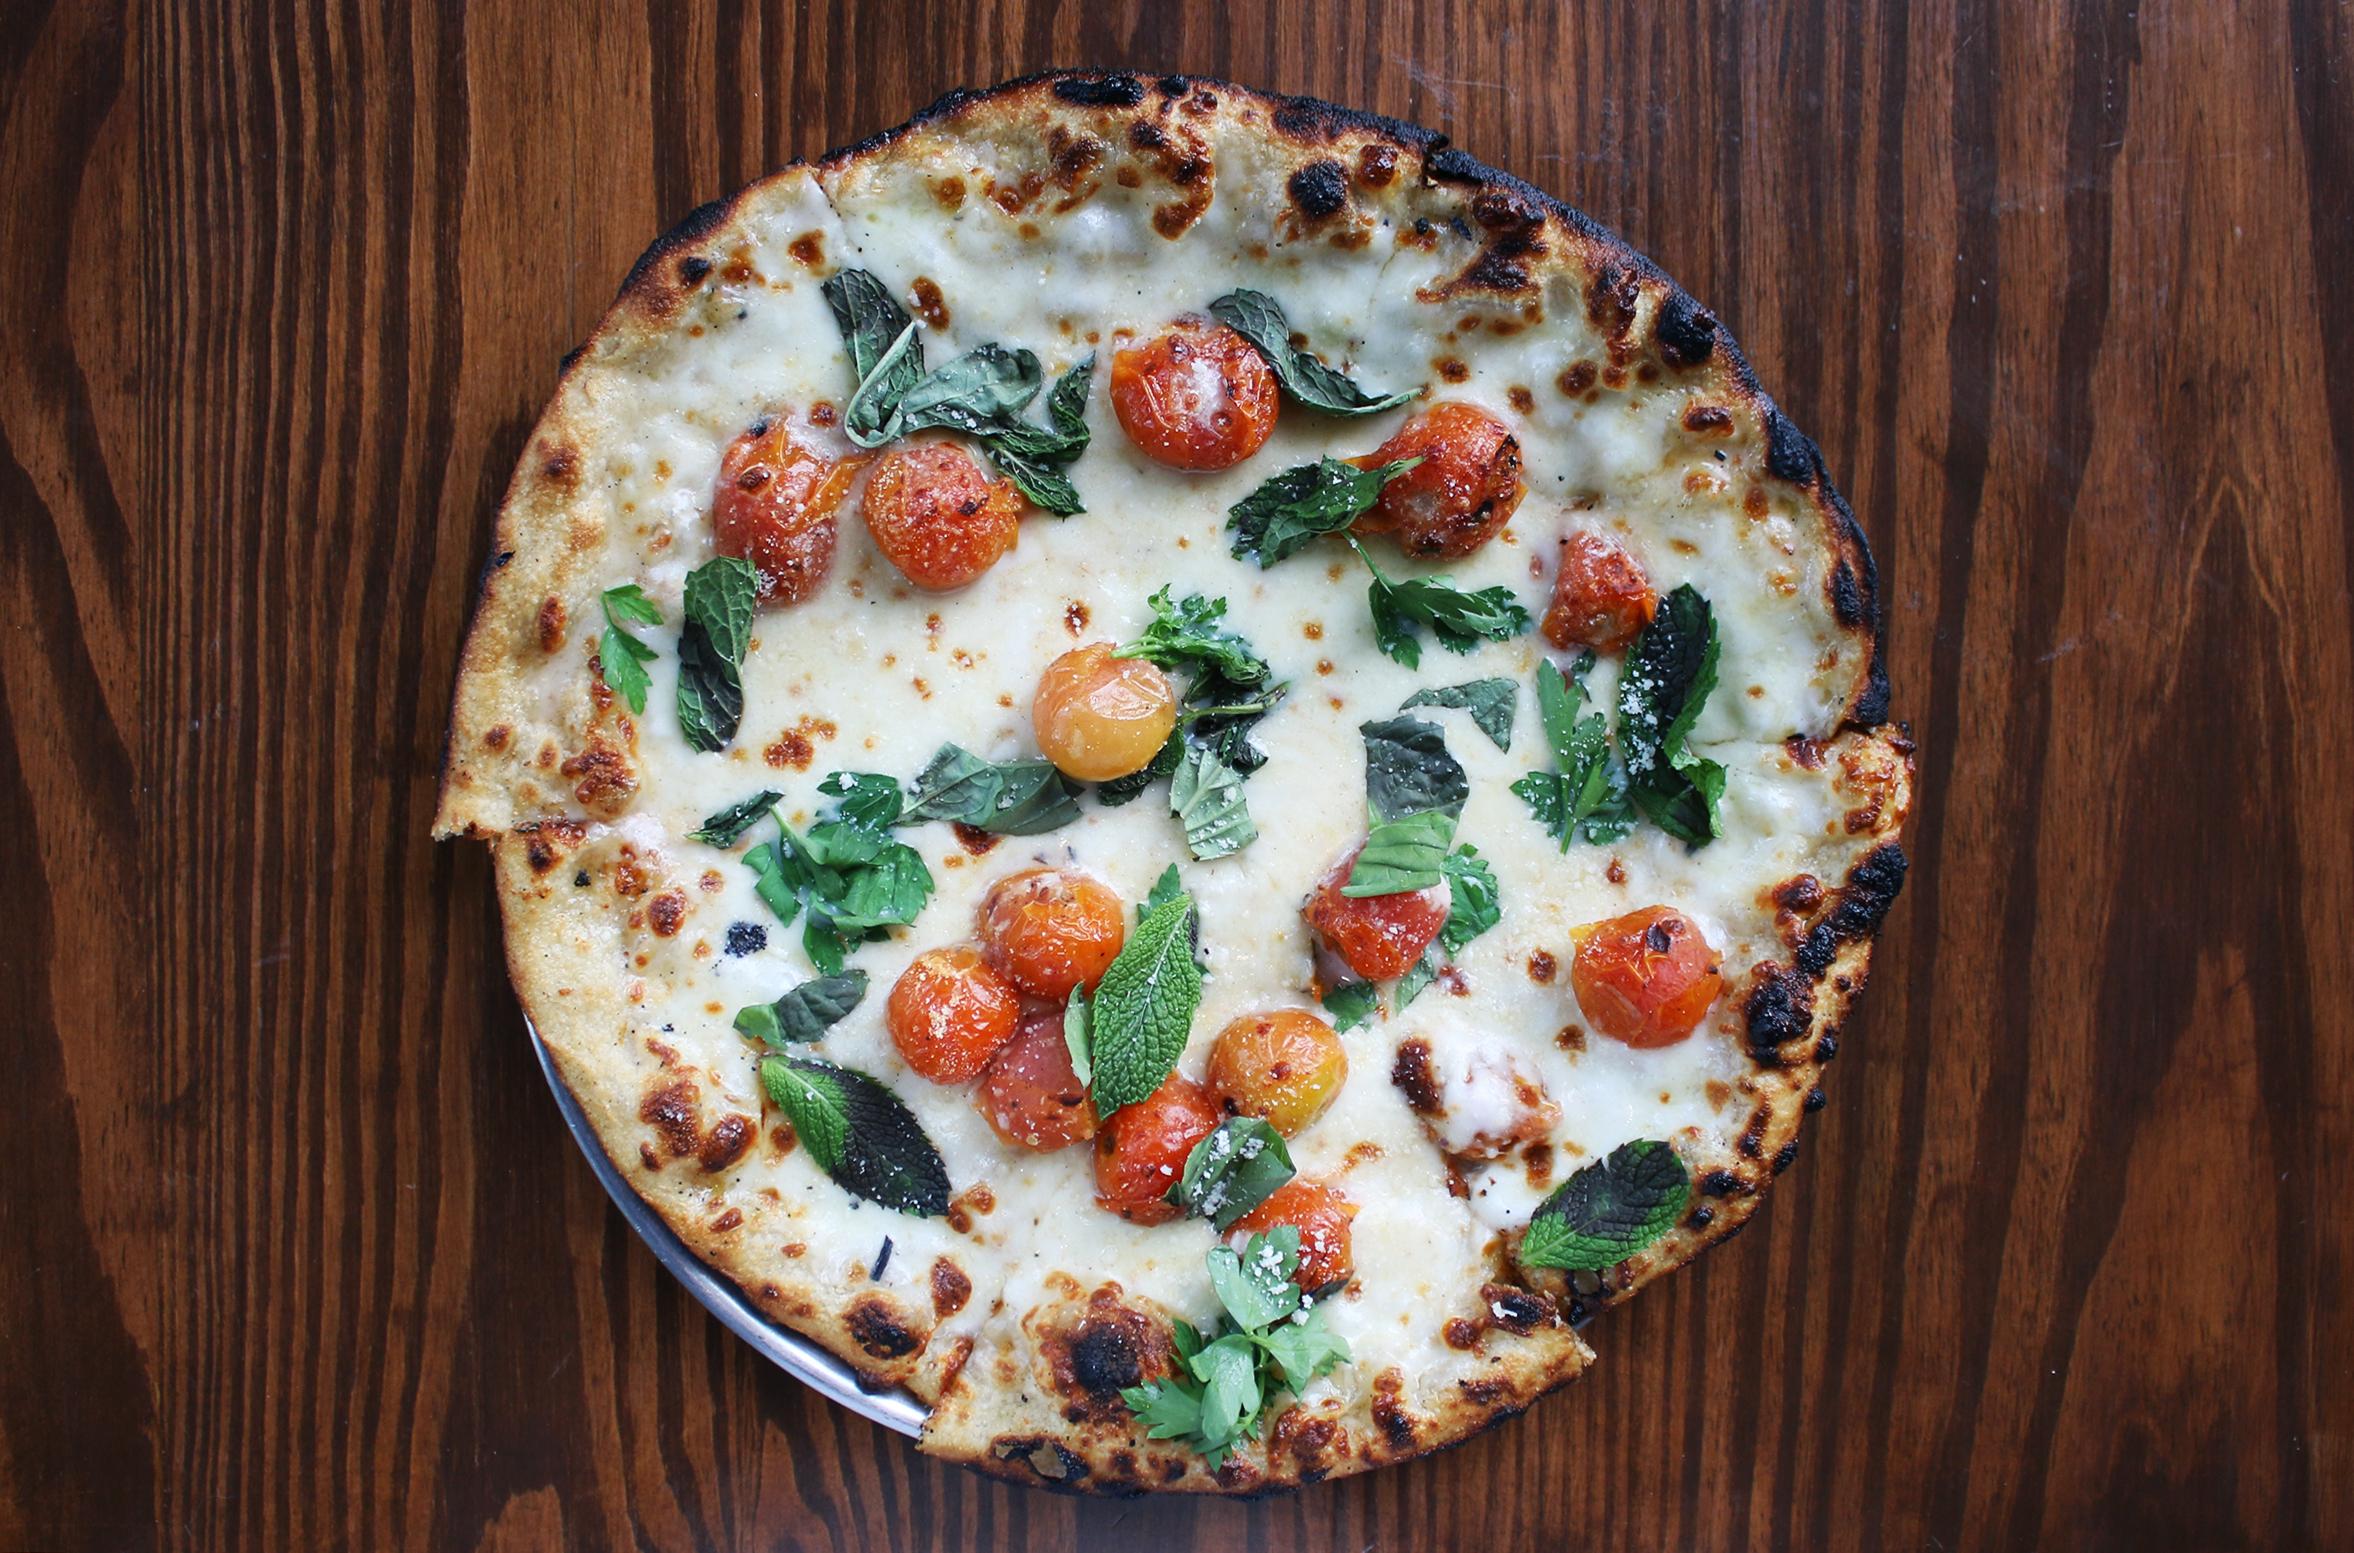 Blistered Cherry Tomato: scamorza, basil, parsley, mint